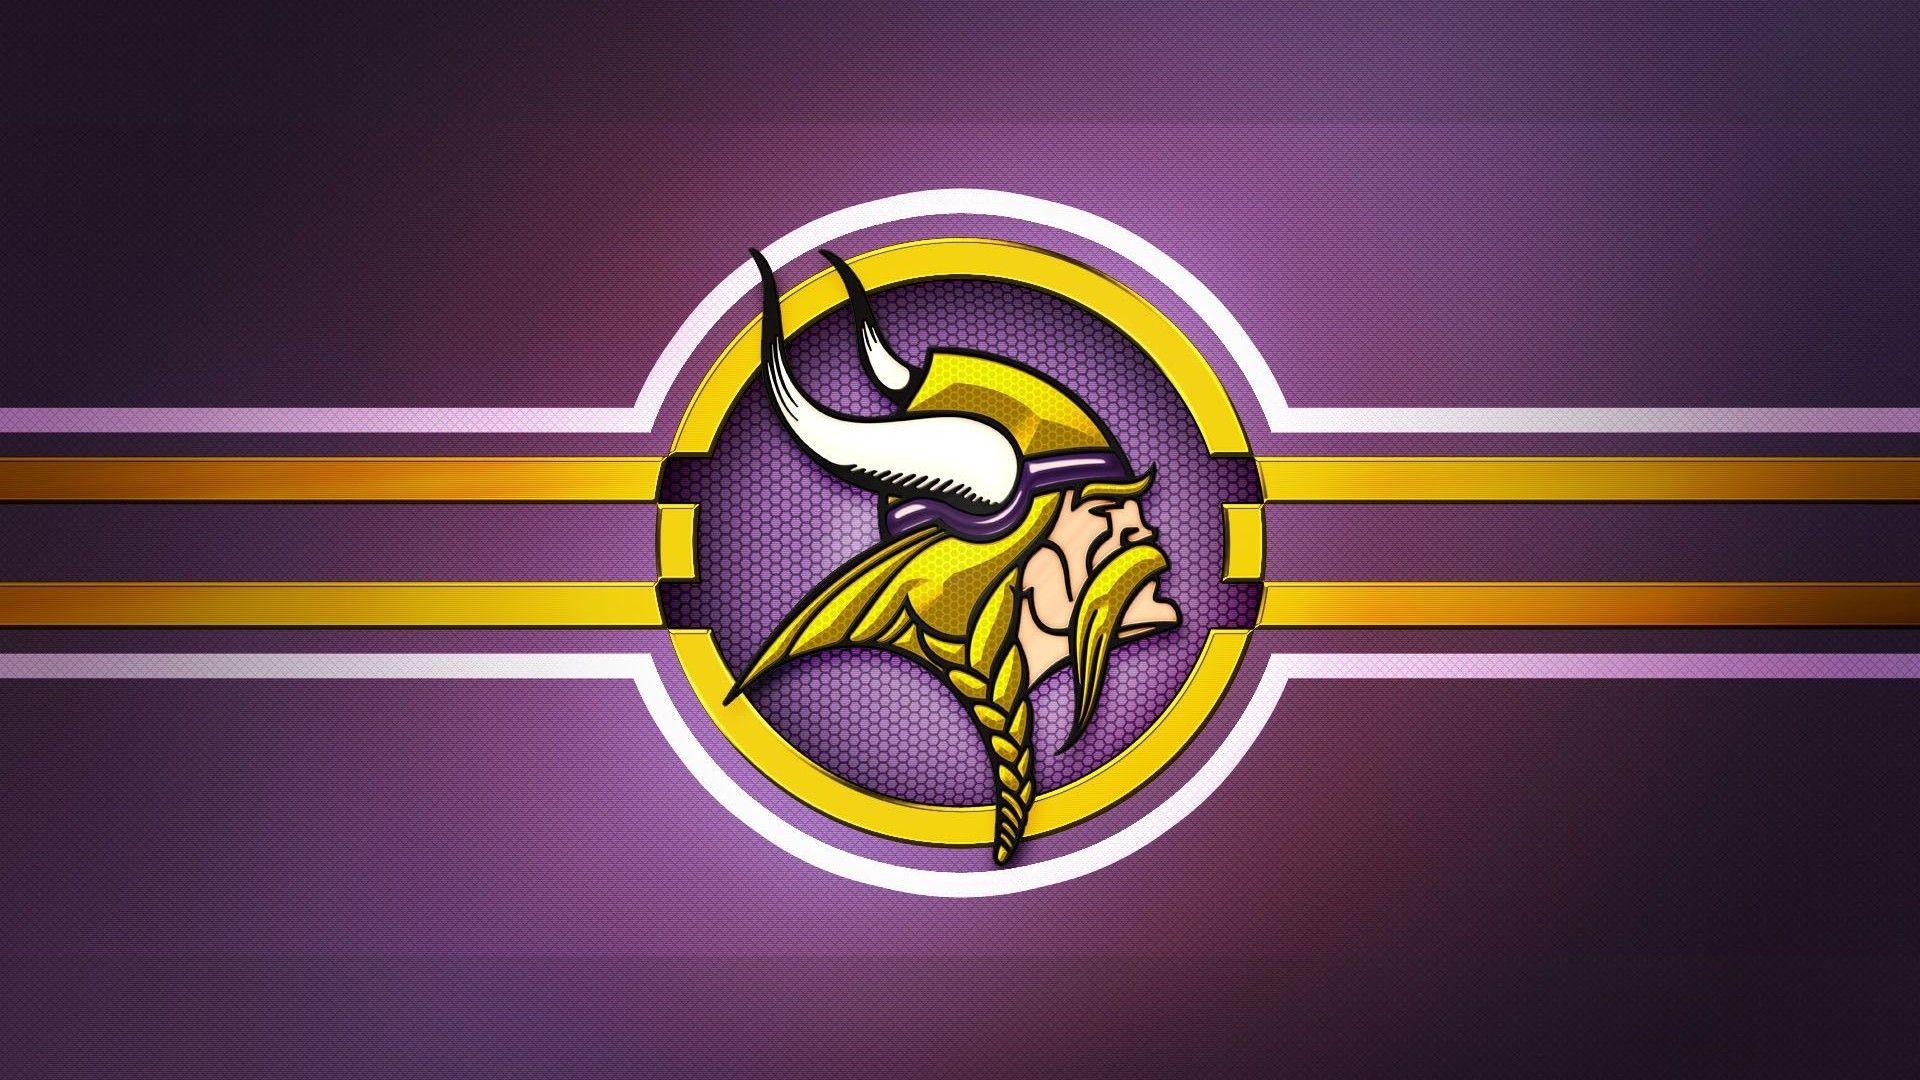 Minnesota Vikings Wallpaper Hd 2020 Nfl Football Wallpapers Minnesota Vikings Logo Minnesota Vikings Football Vikings Football